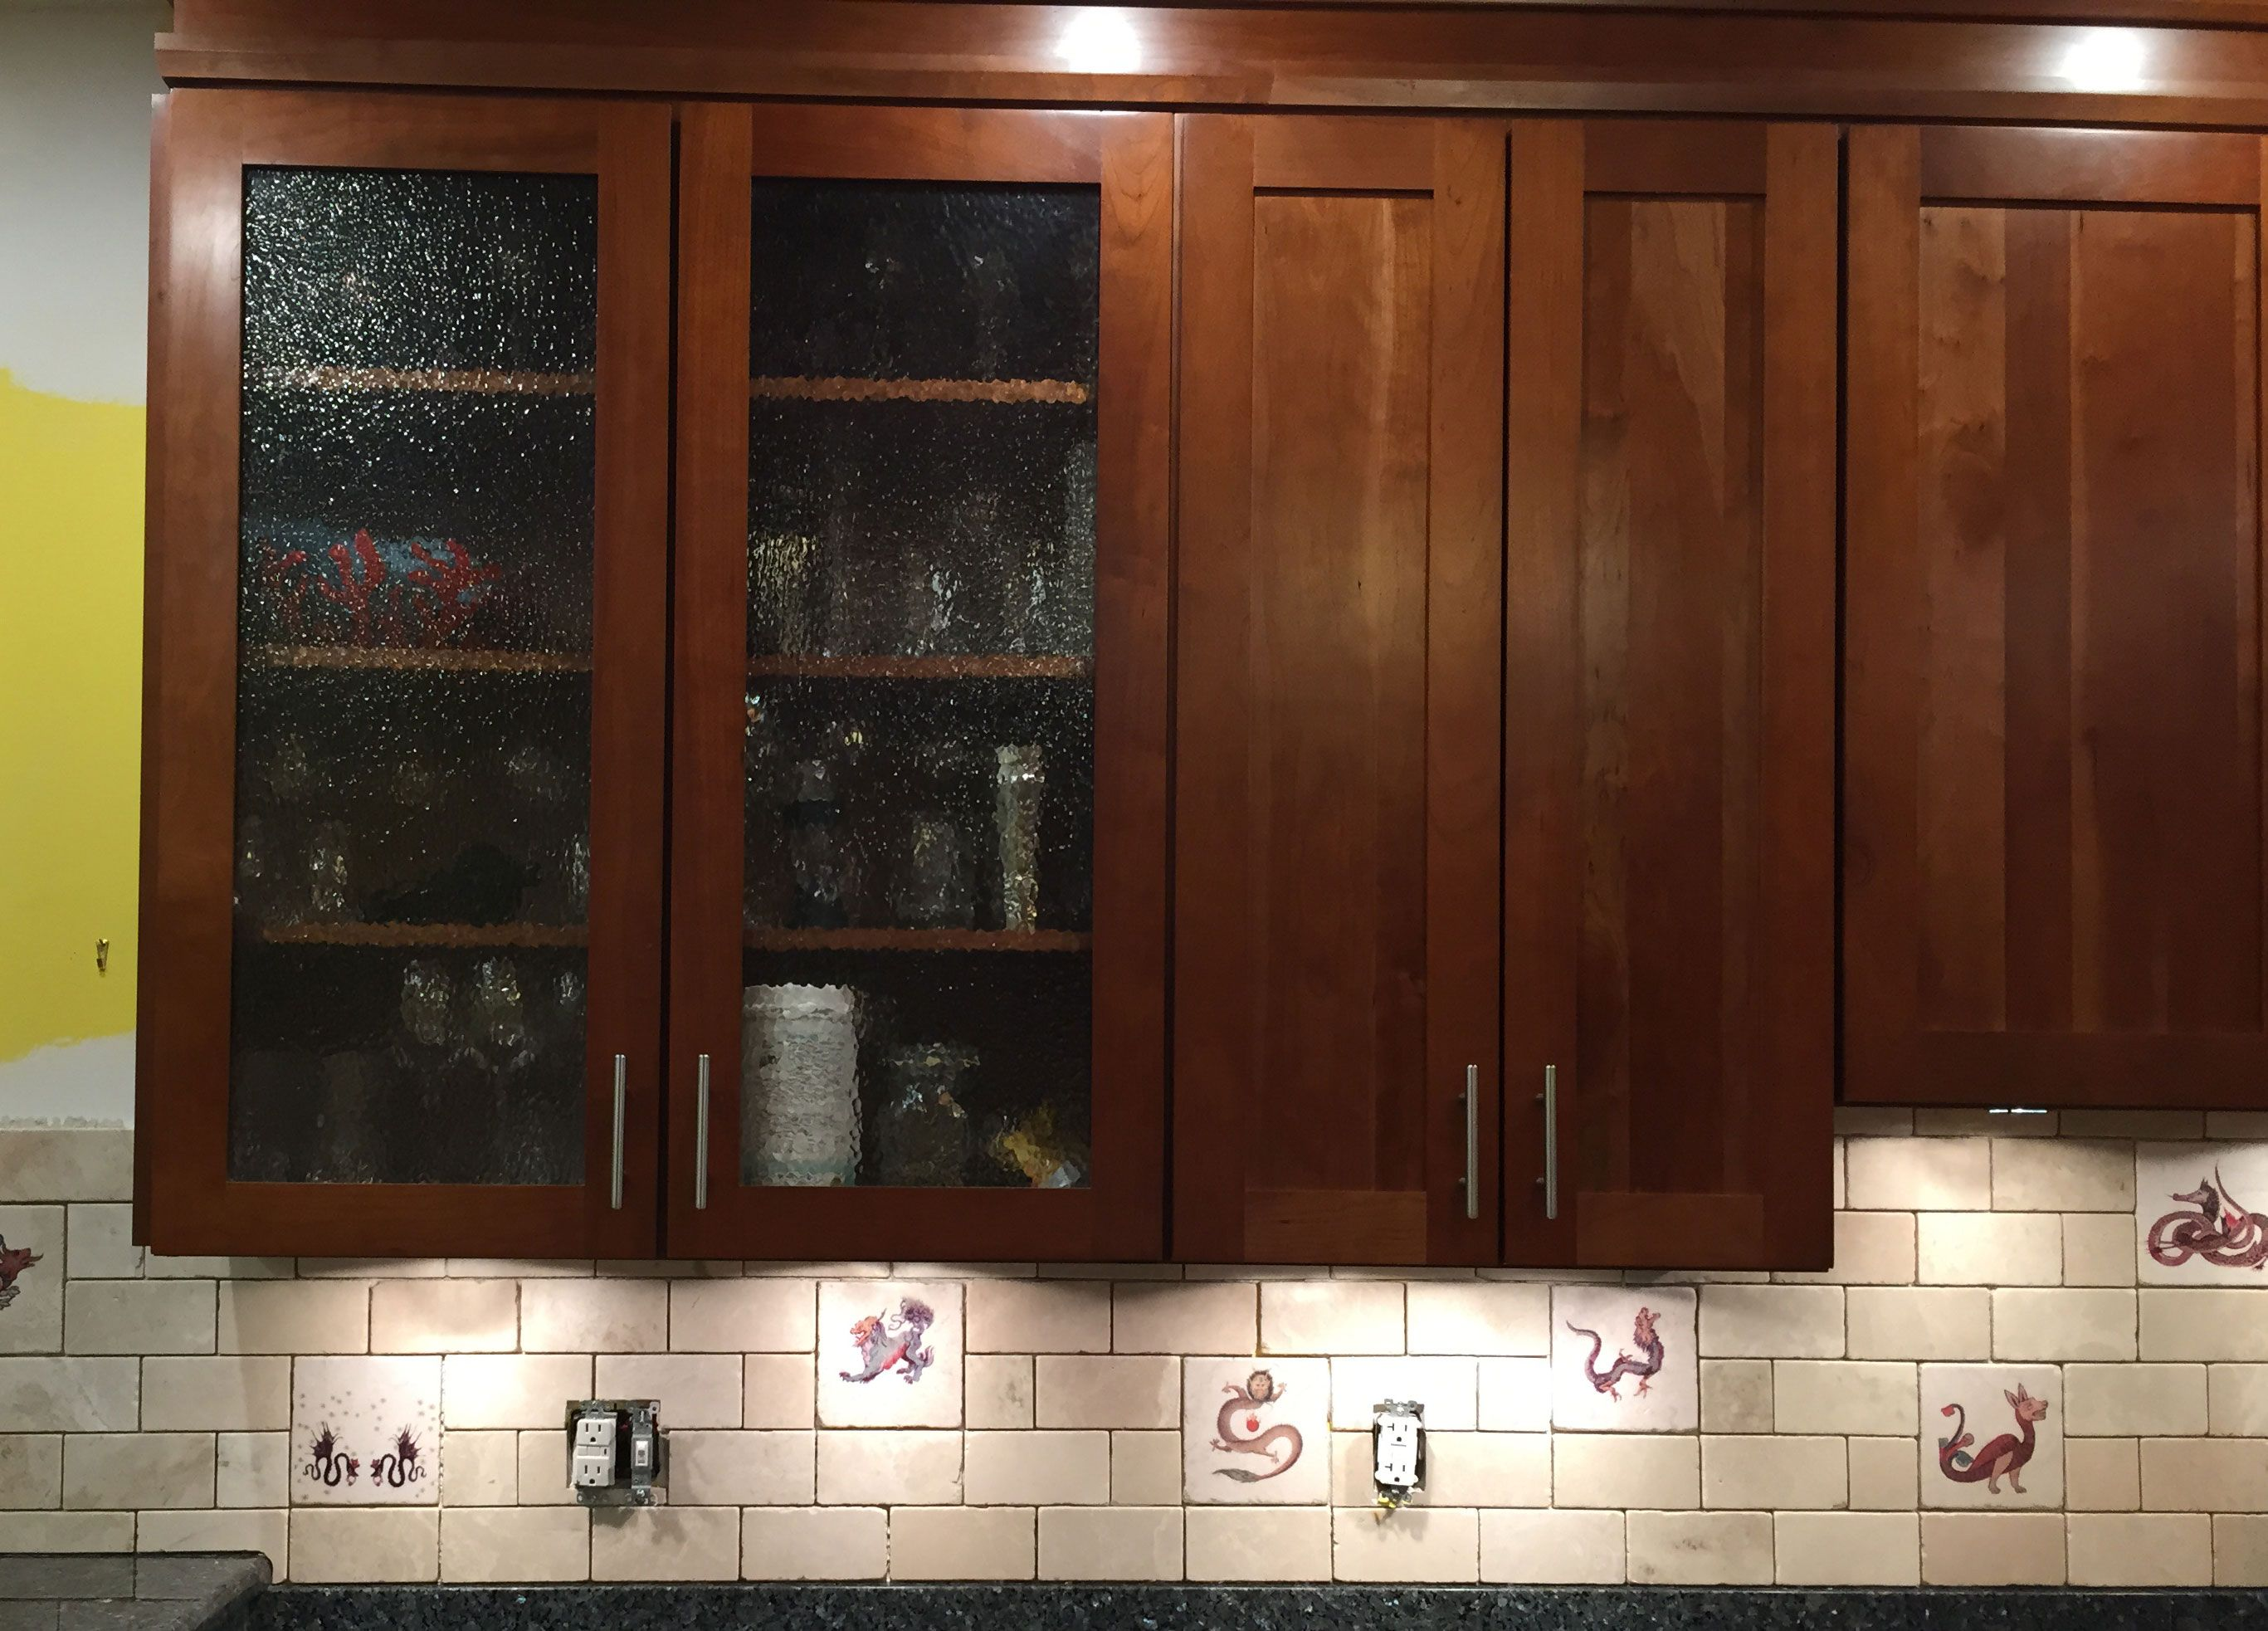 Tumbled Marble Dragon Kitchen Back Splash Before Grout William Morris Tile Installation Tiles